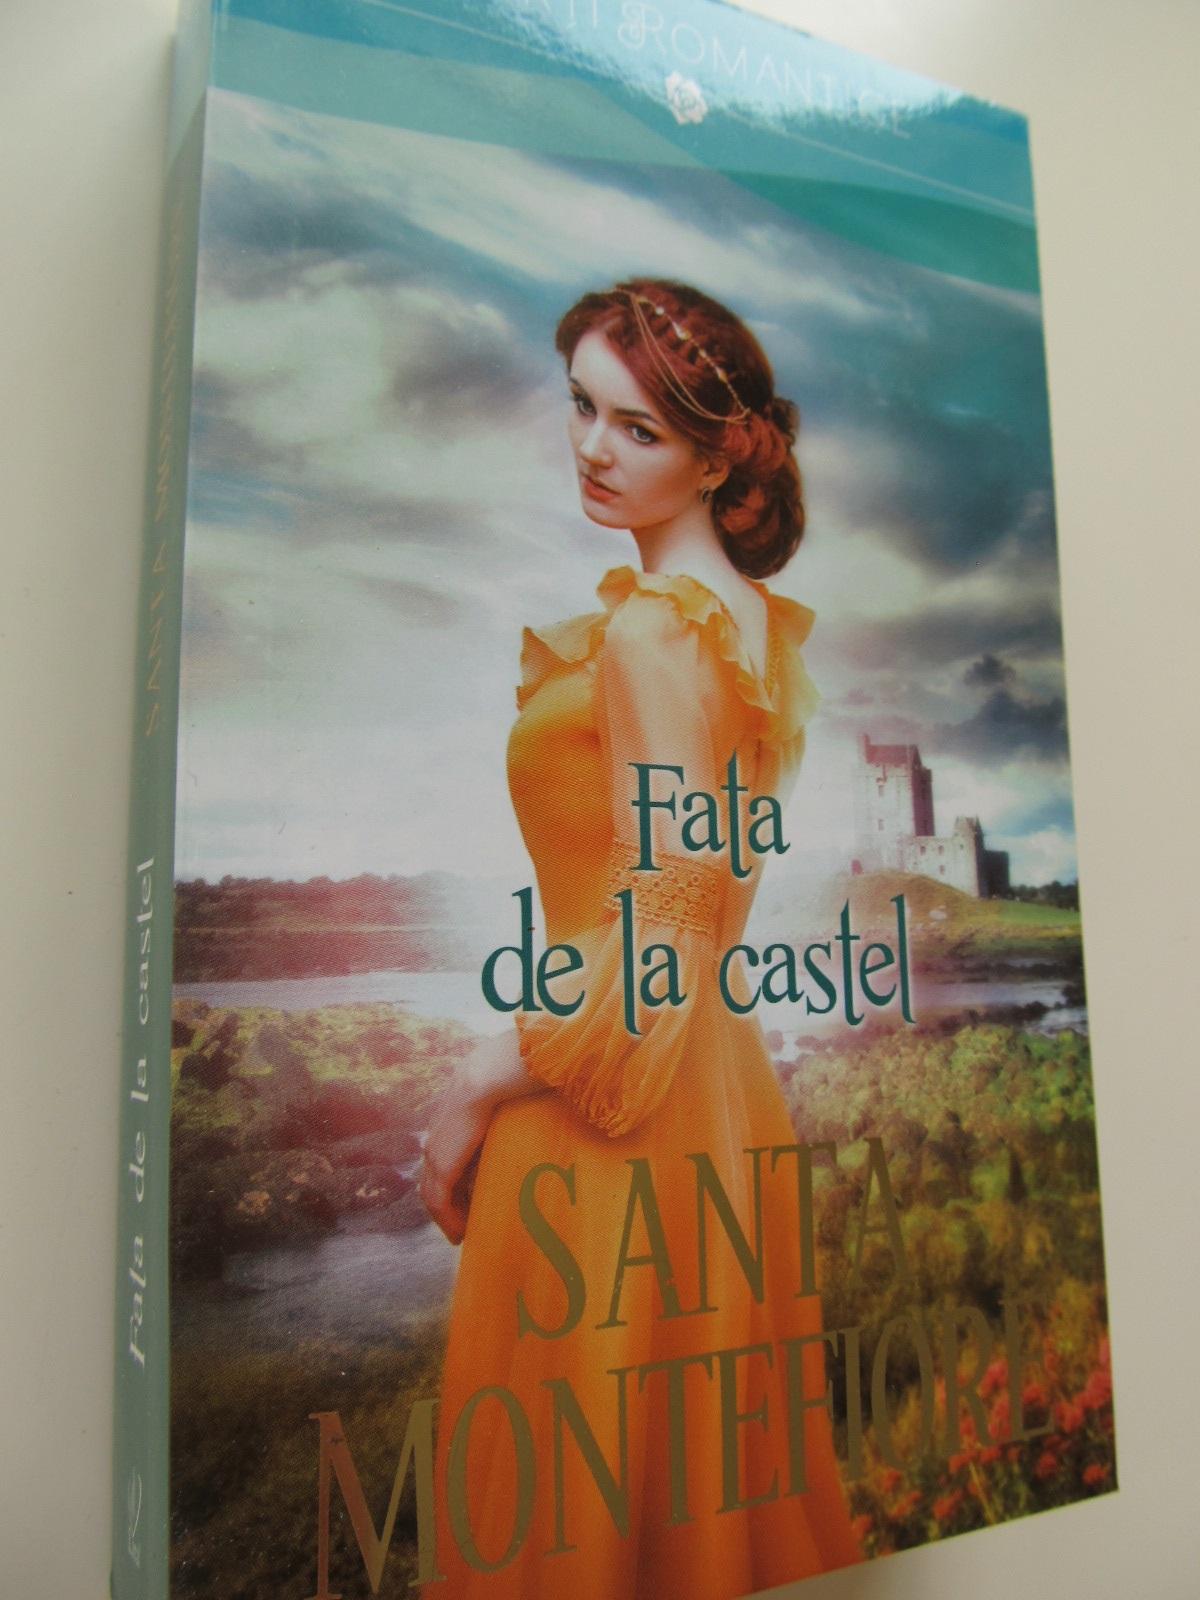 Fata de la castel - Santa Montefiori | Detalii carte